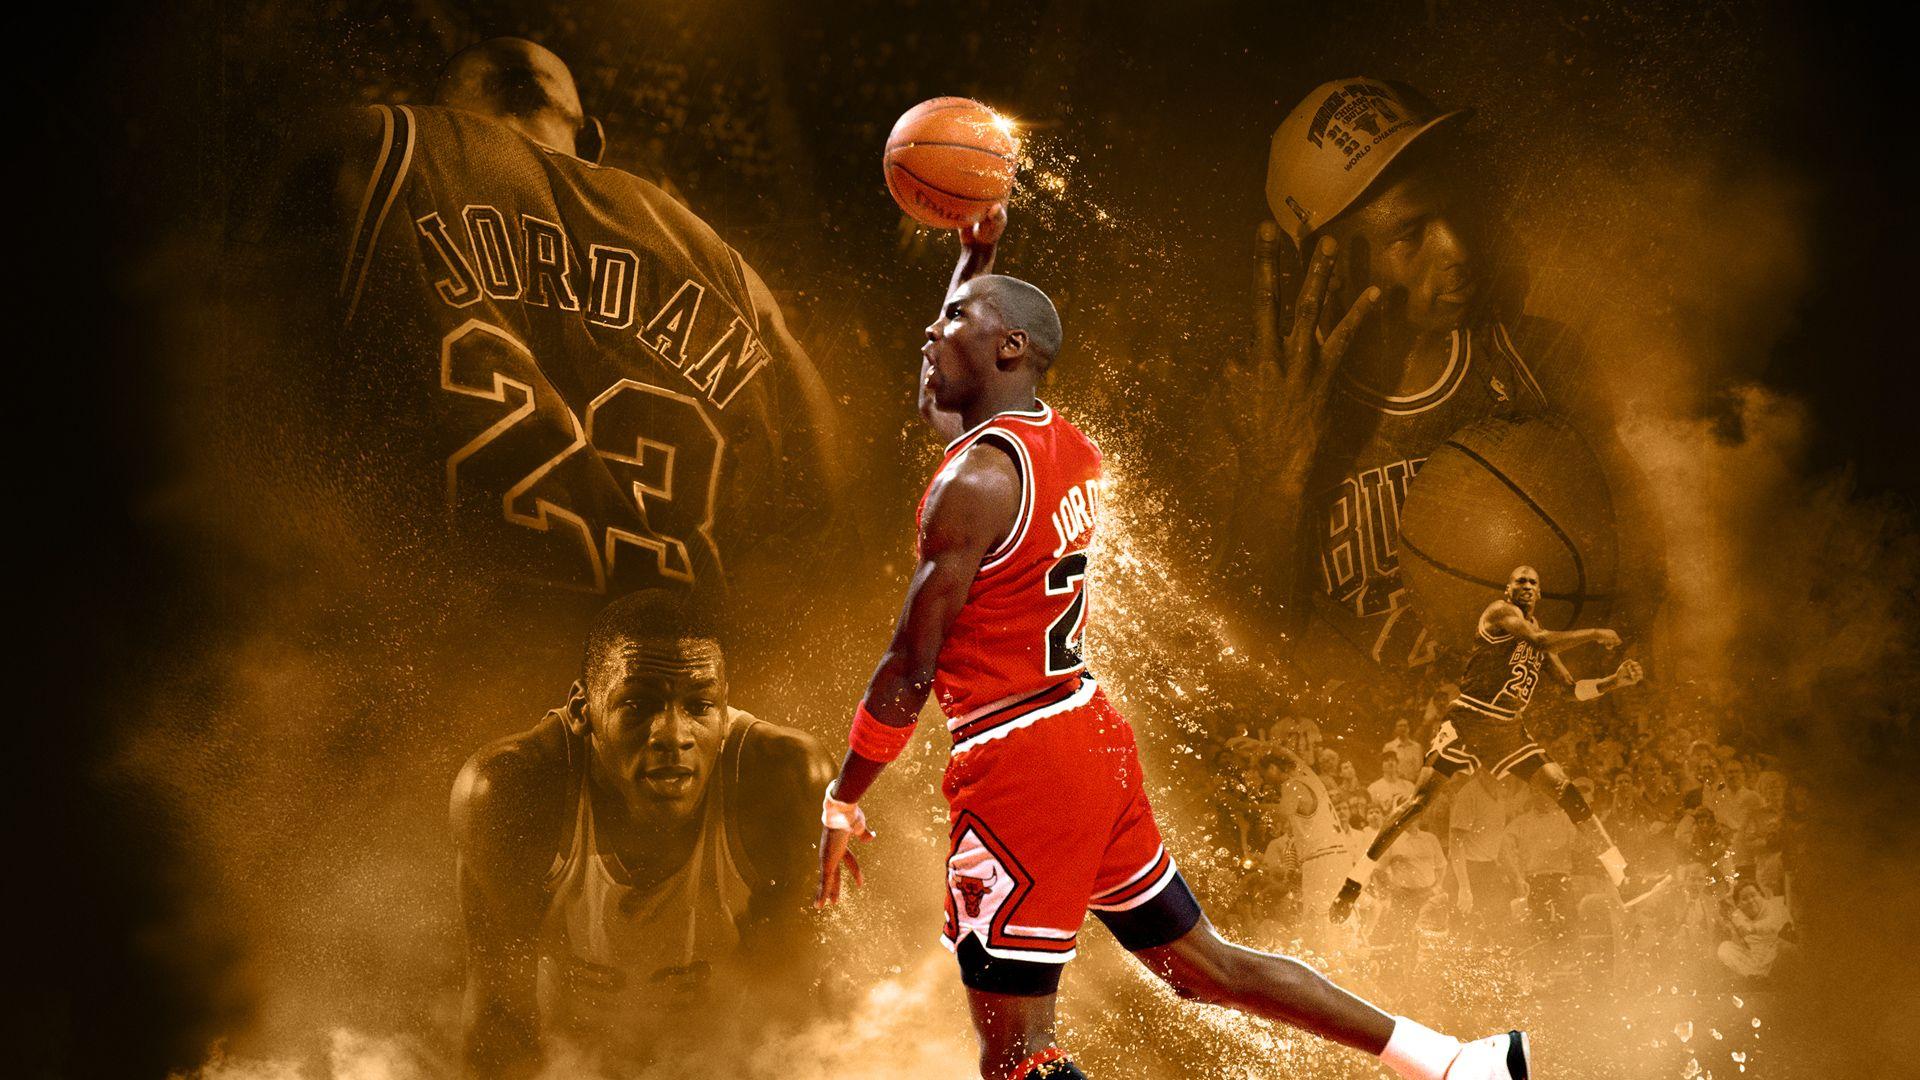 Michael Jordan Wallpaper Collection For Free Download HD